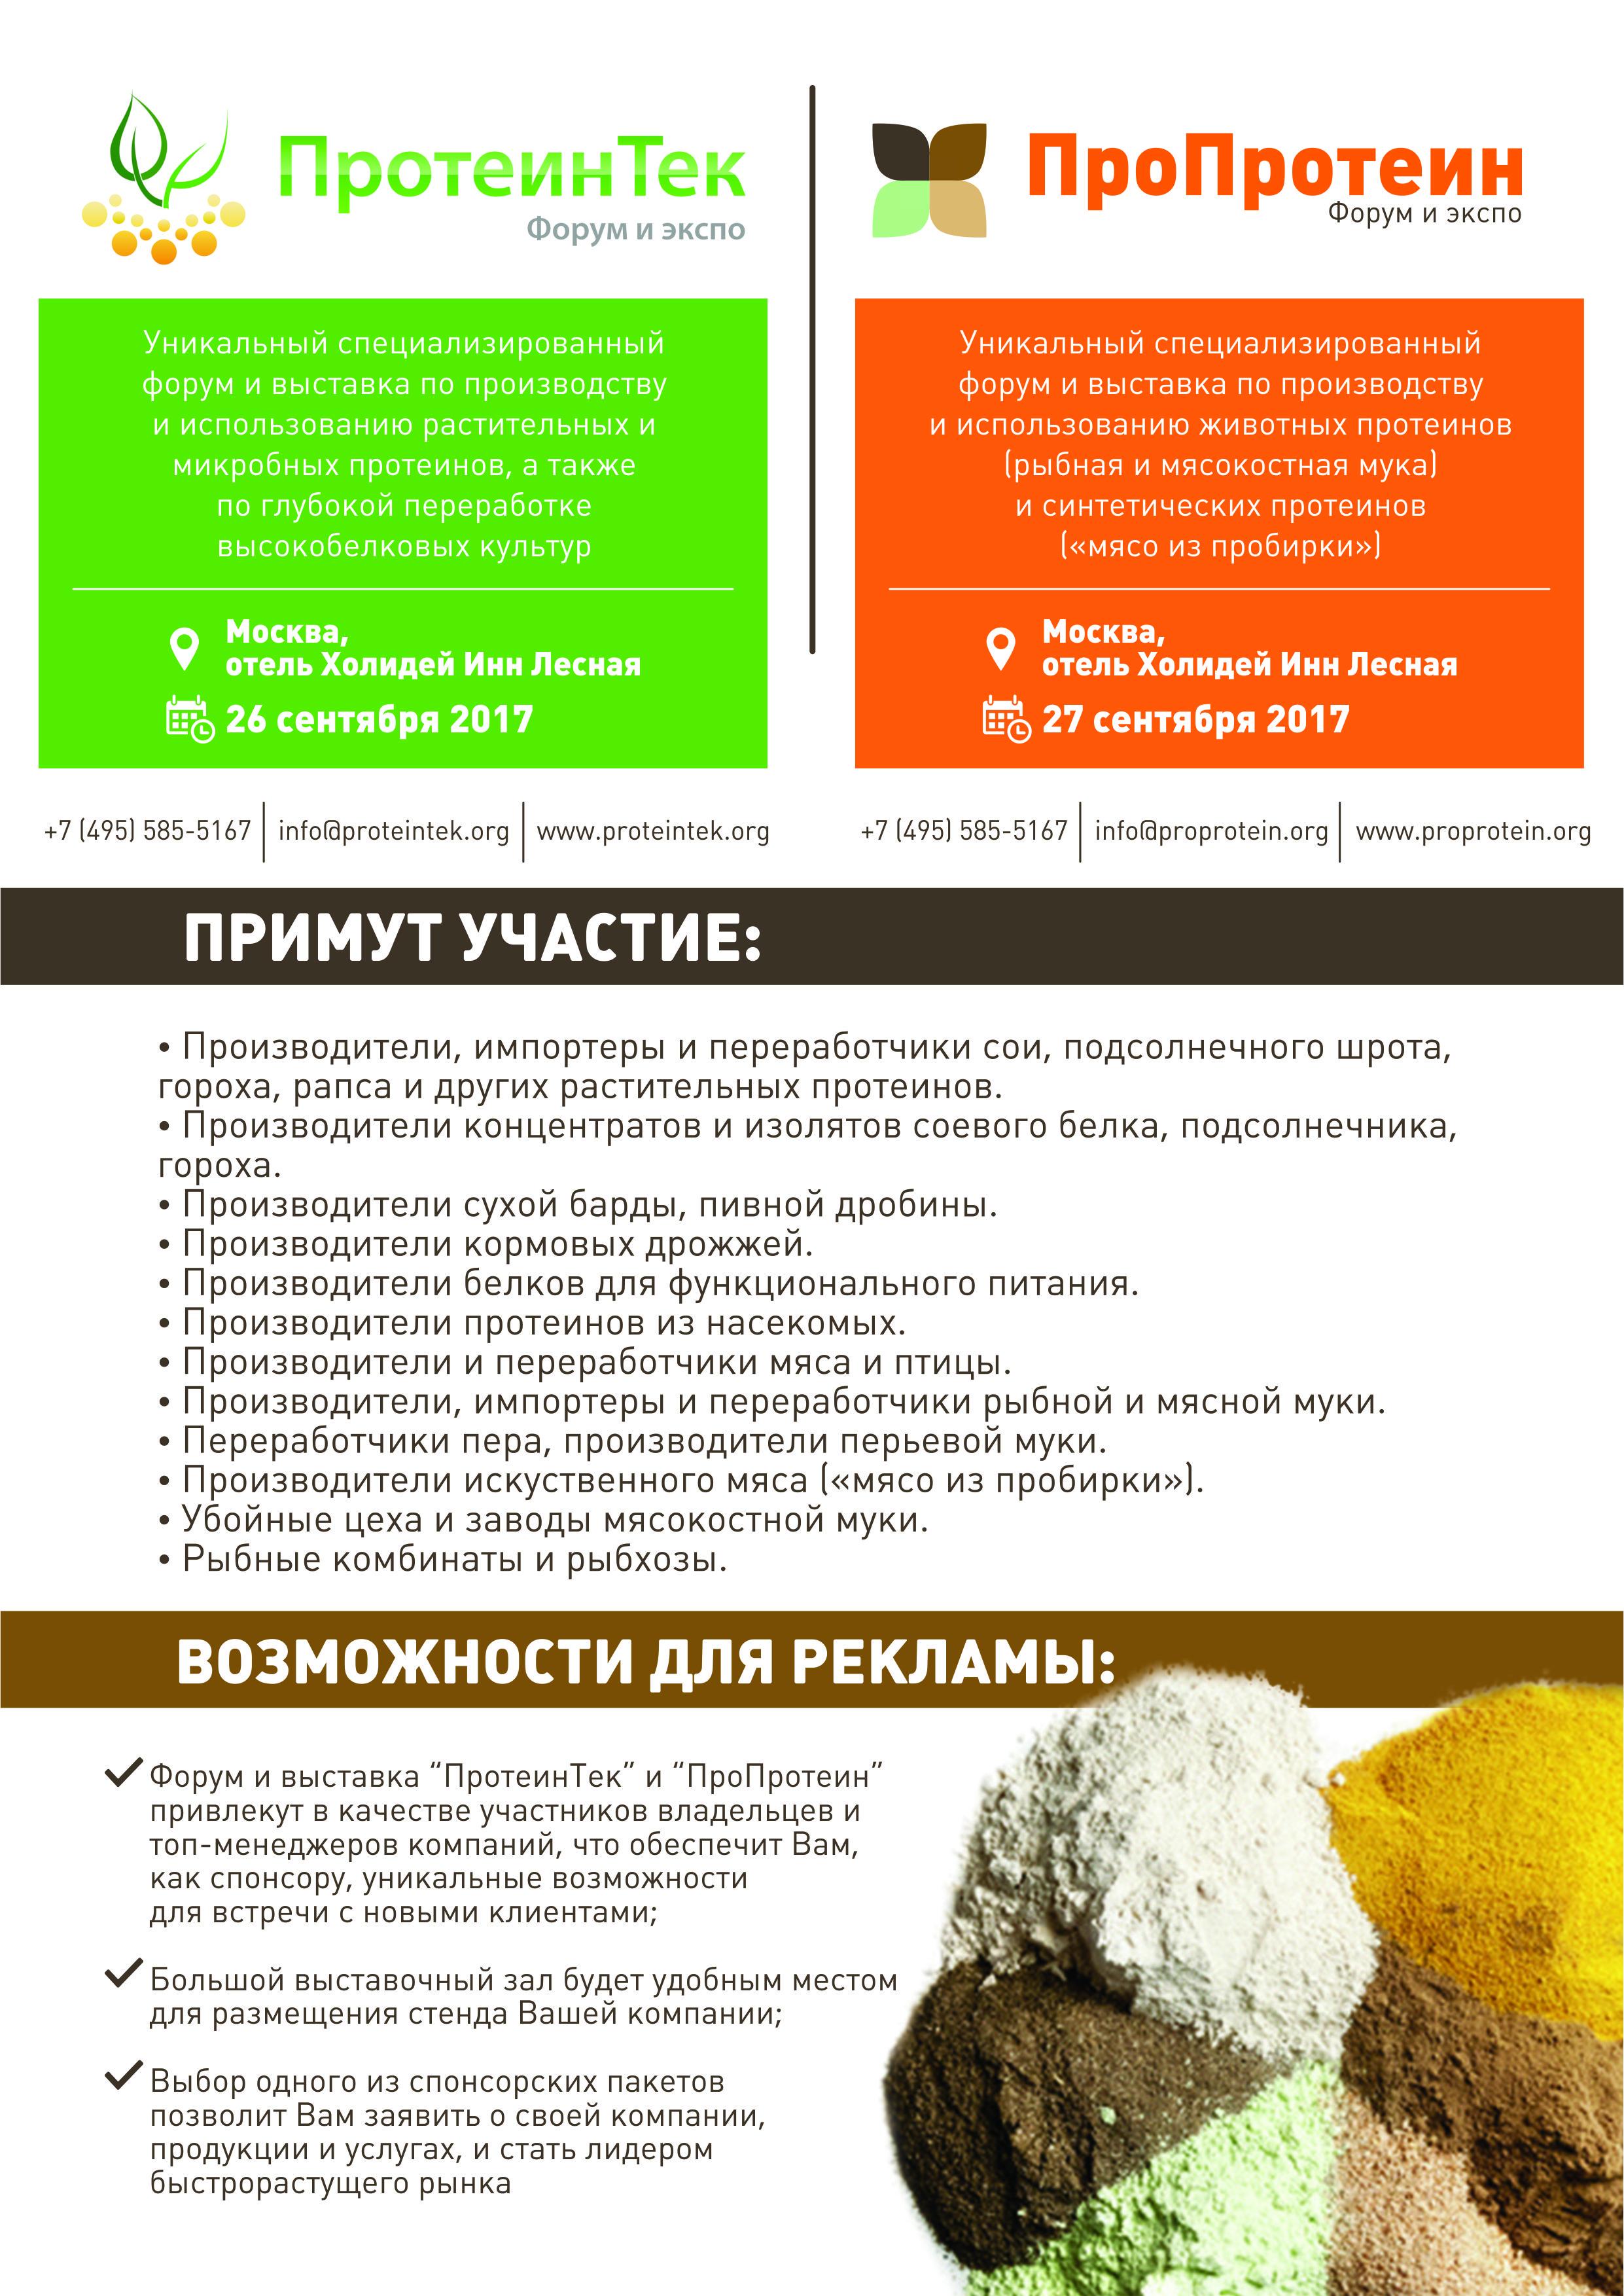 ПротеинТек ПроПроте��н 2017 МАКЕТ